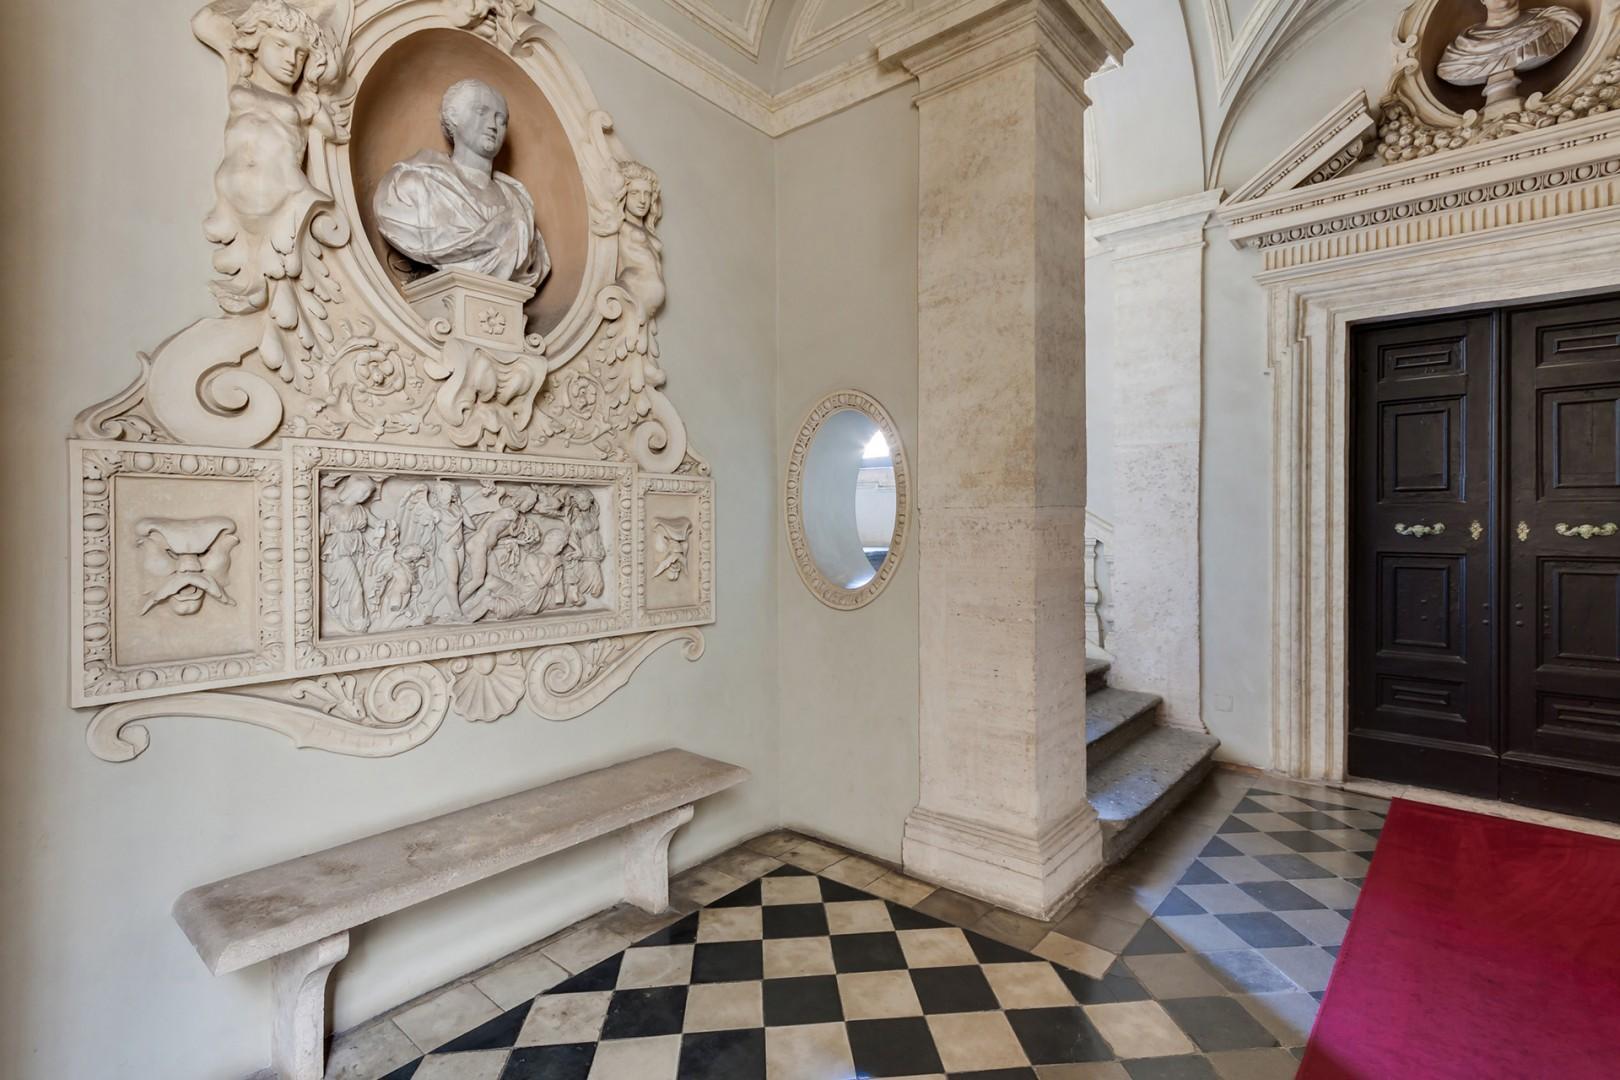 History haunts the halls of the palazzo.